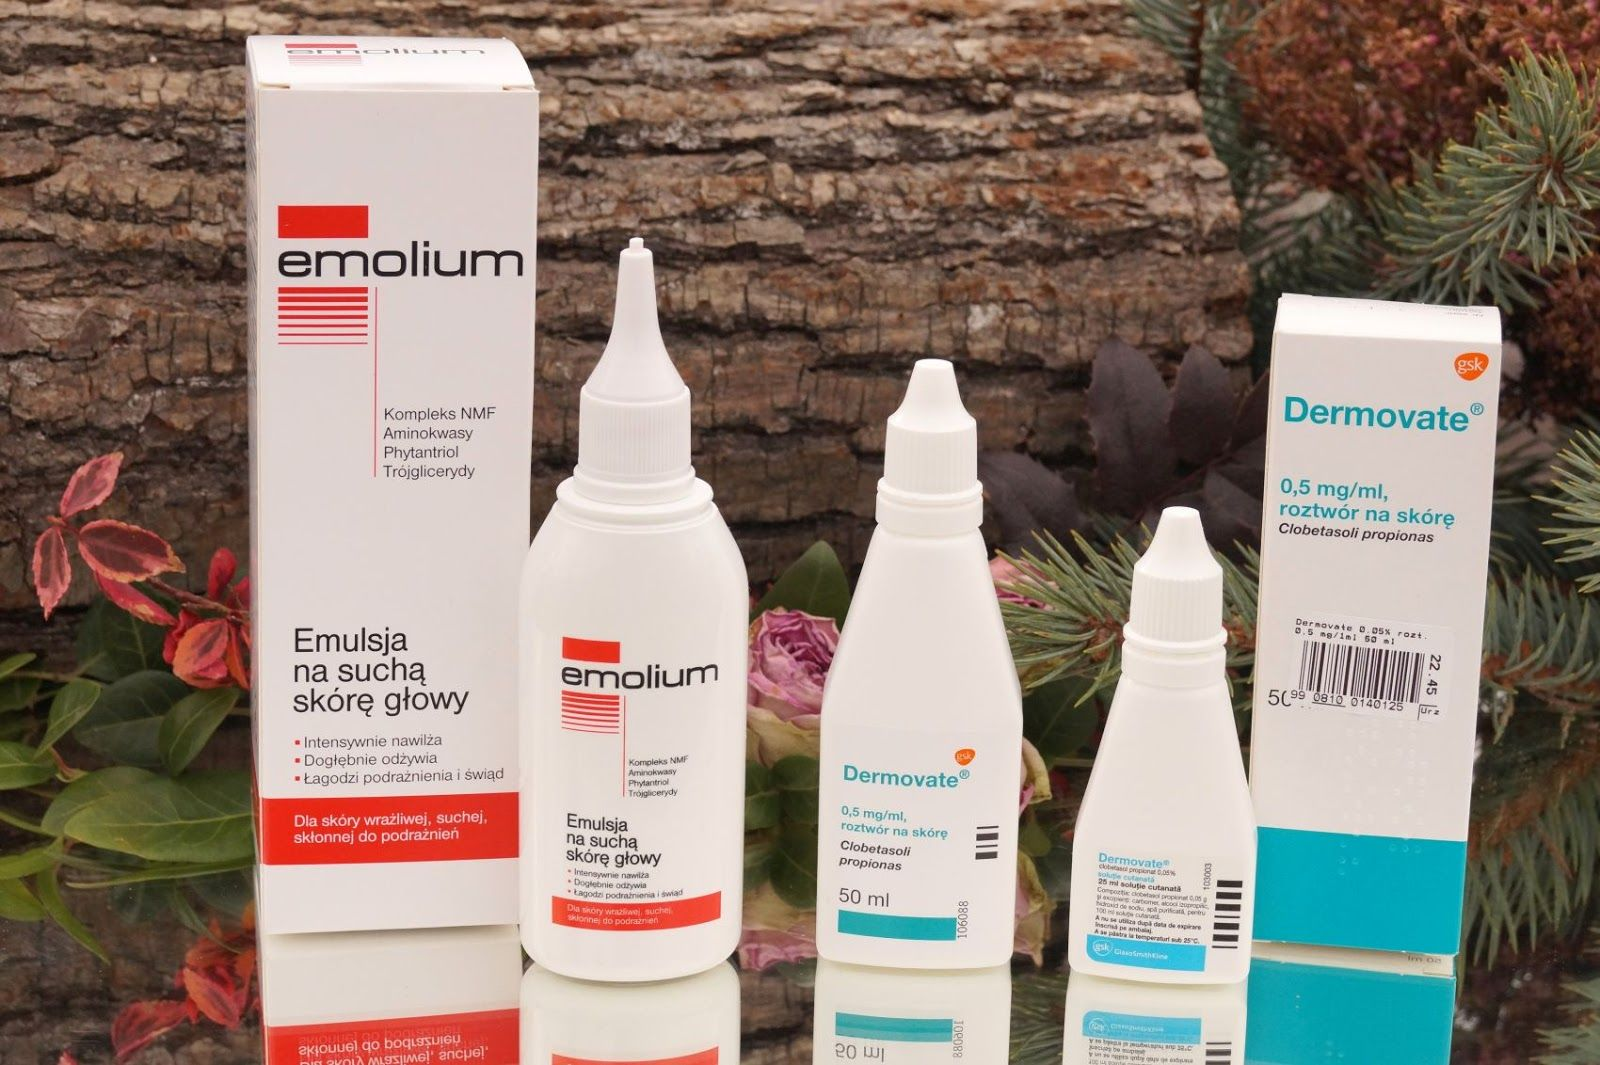 Babski Kacik Emulsja Emolium Na Sucha Skore Glowy Dermovate Na Rp Dish Soap Bottle Spray Bottle Spray